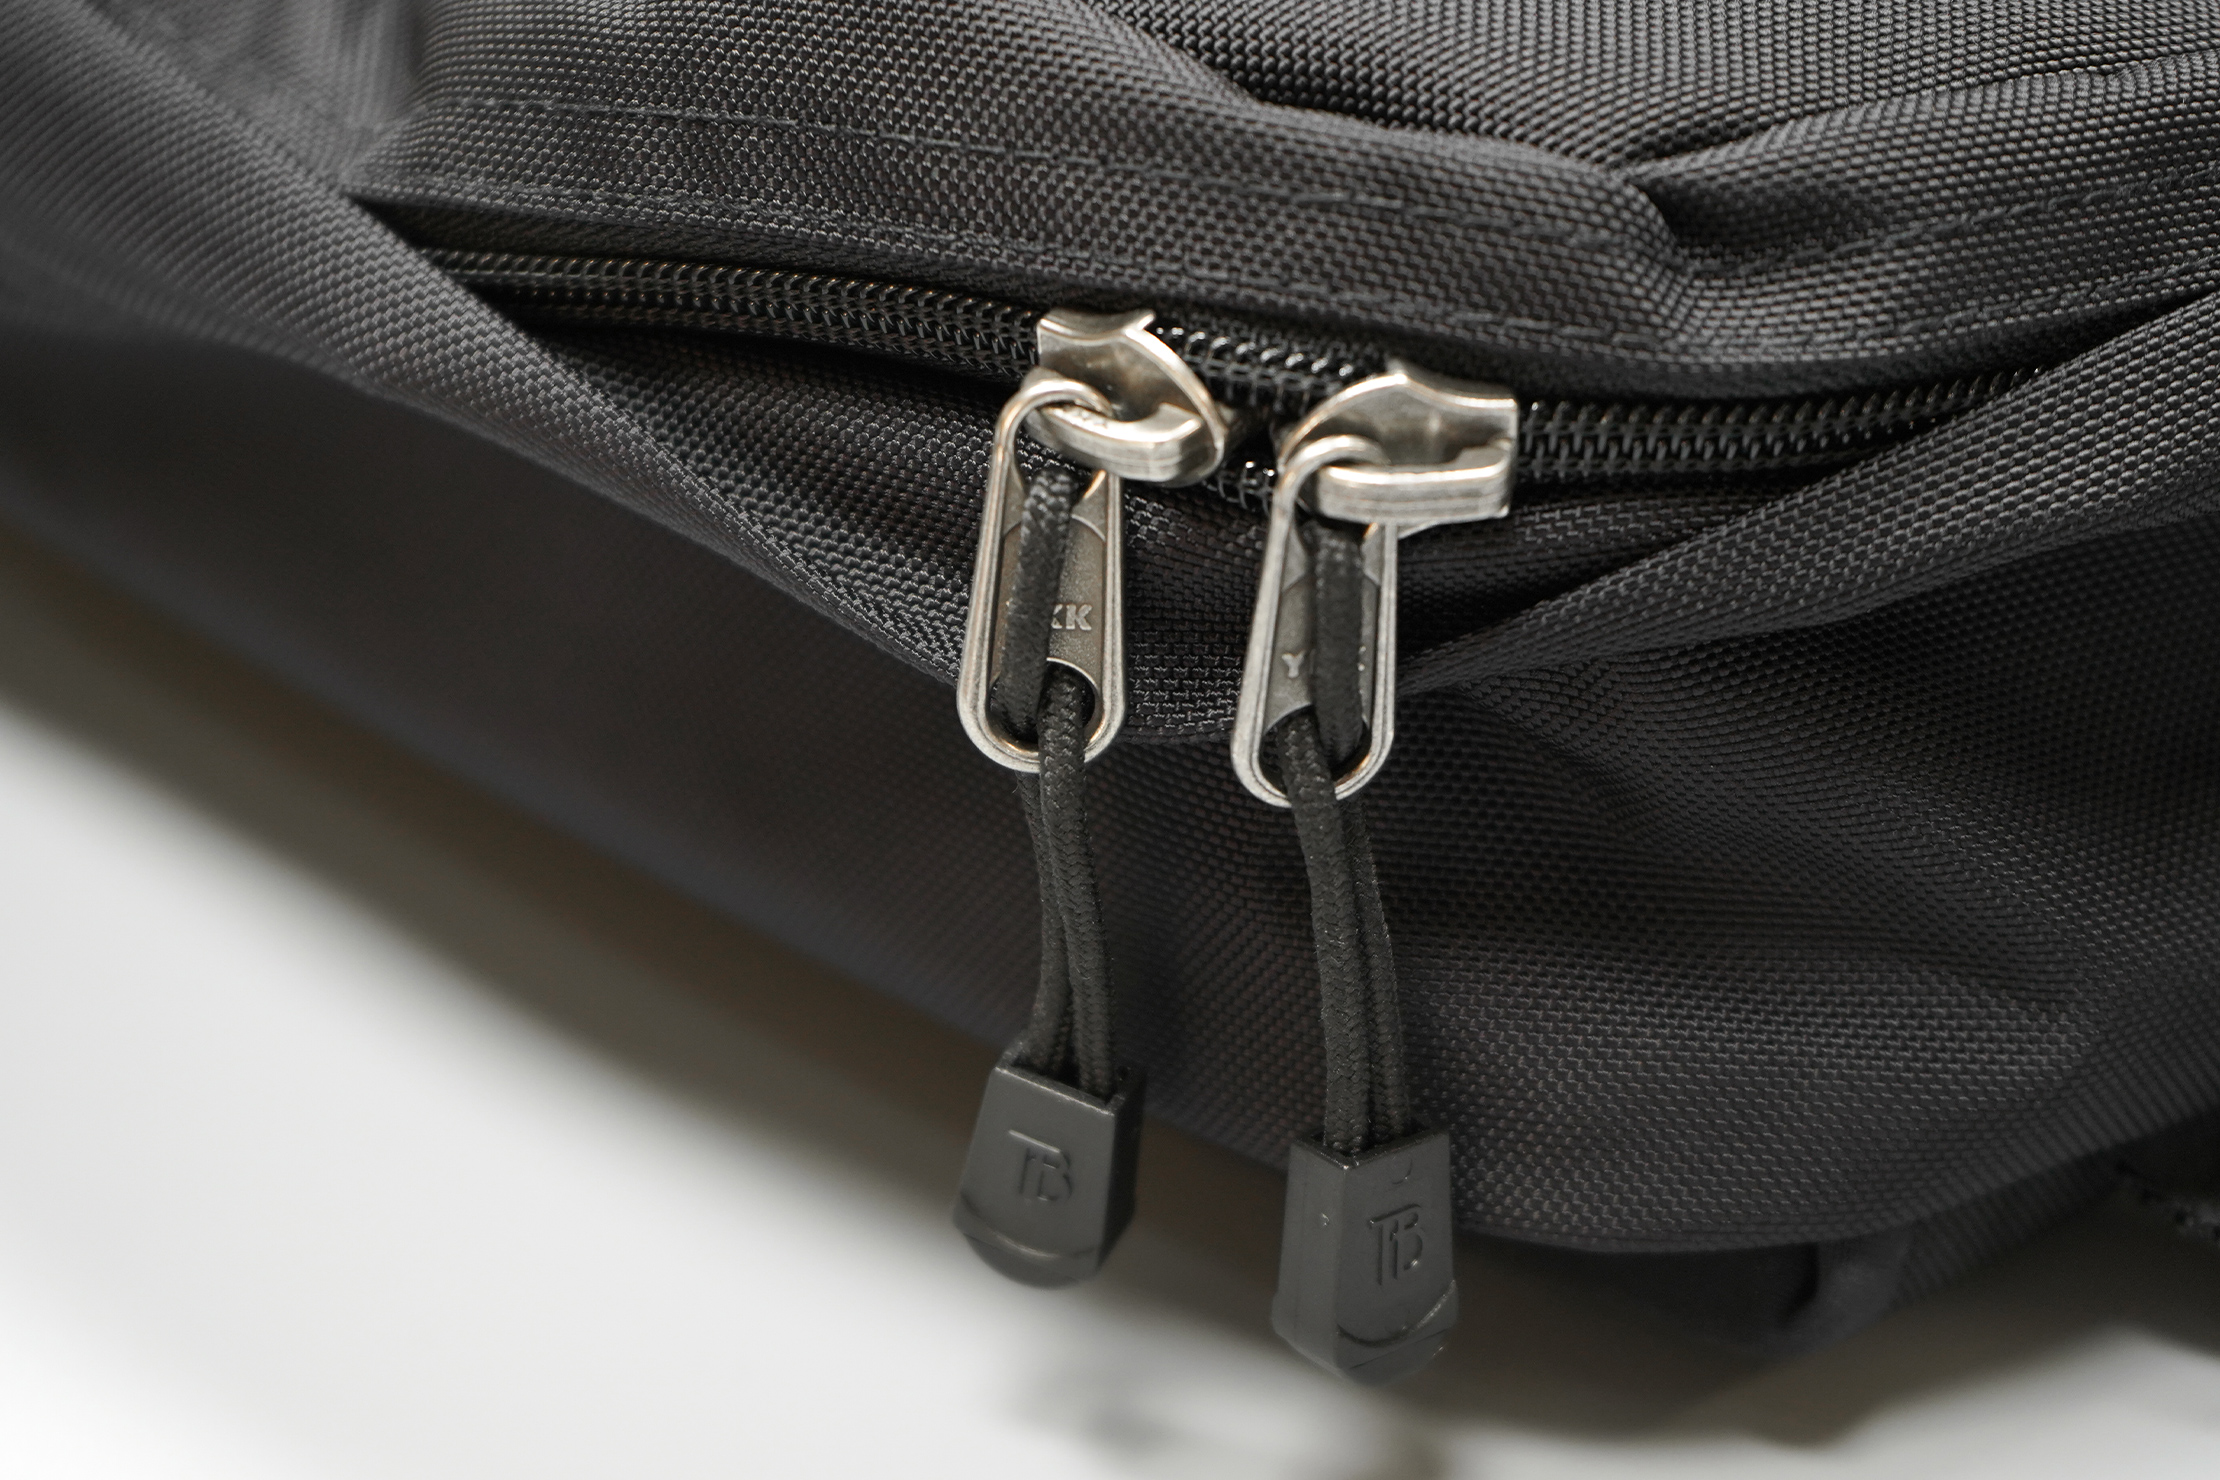 Tom Bihn Paragon Backpack | YKK zippers with Tom Bihn zipper pulls